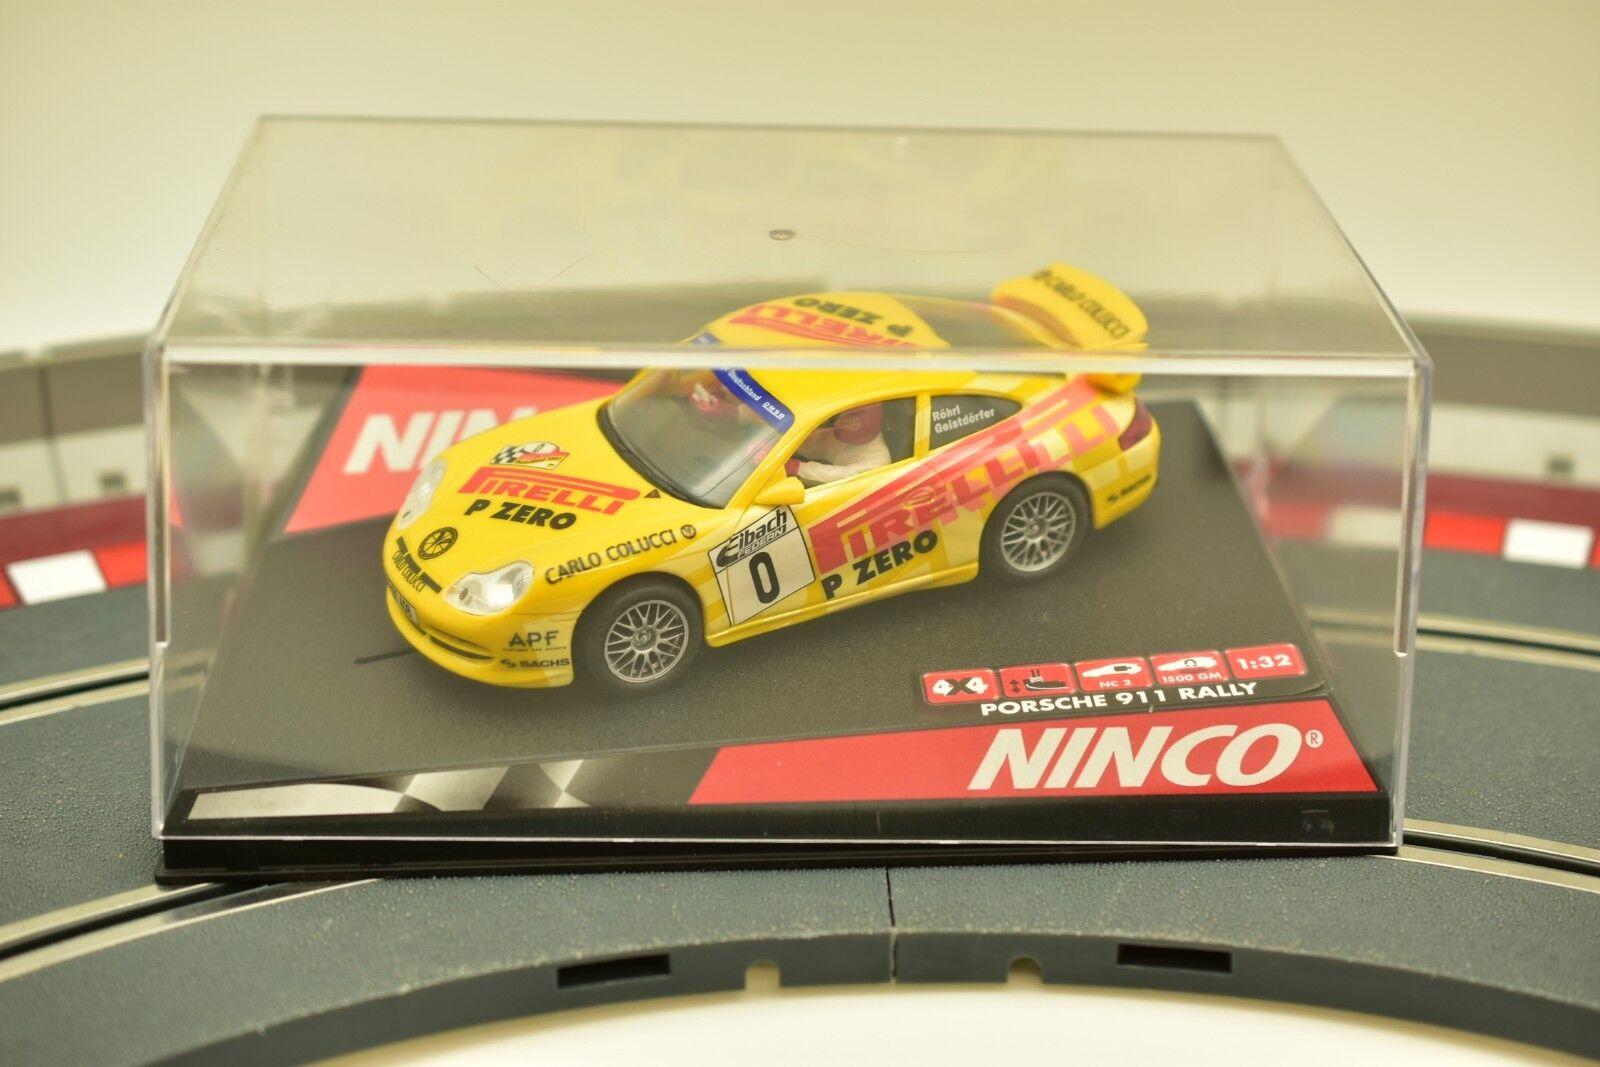 "NINCO 1//32 SLOT CARS 50256 PORSCHE 911 GERMAN RALLY /""PIRELLI/""  YELLOW # 0"